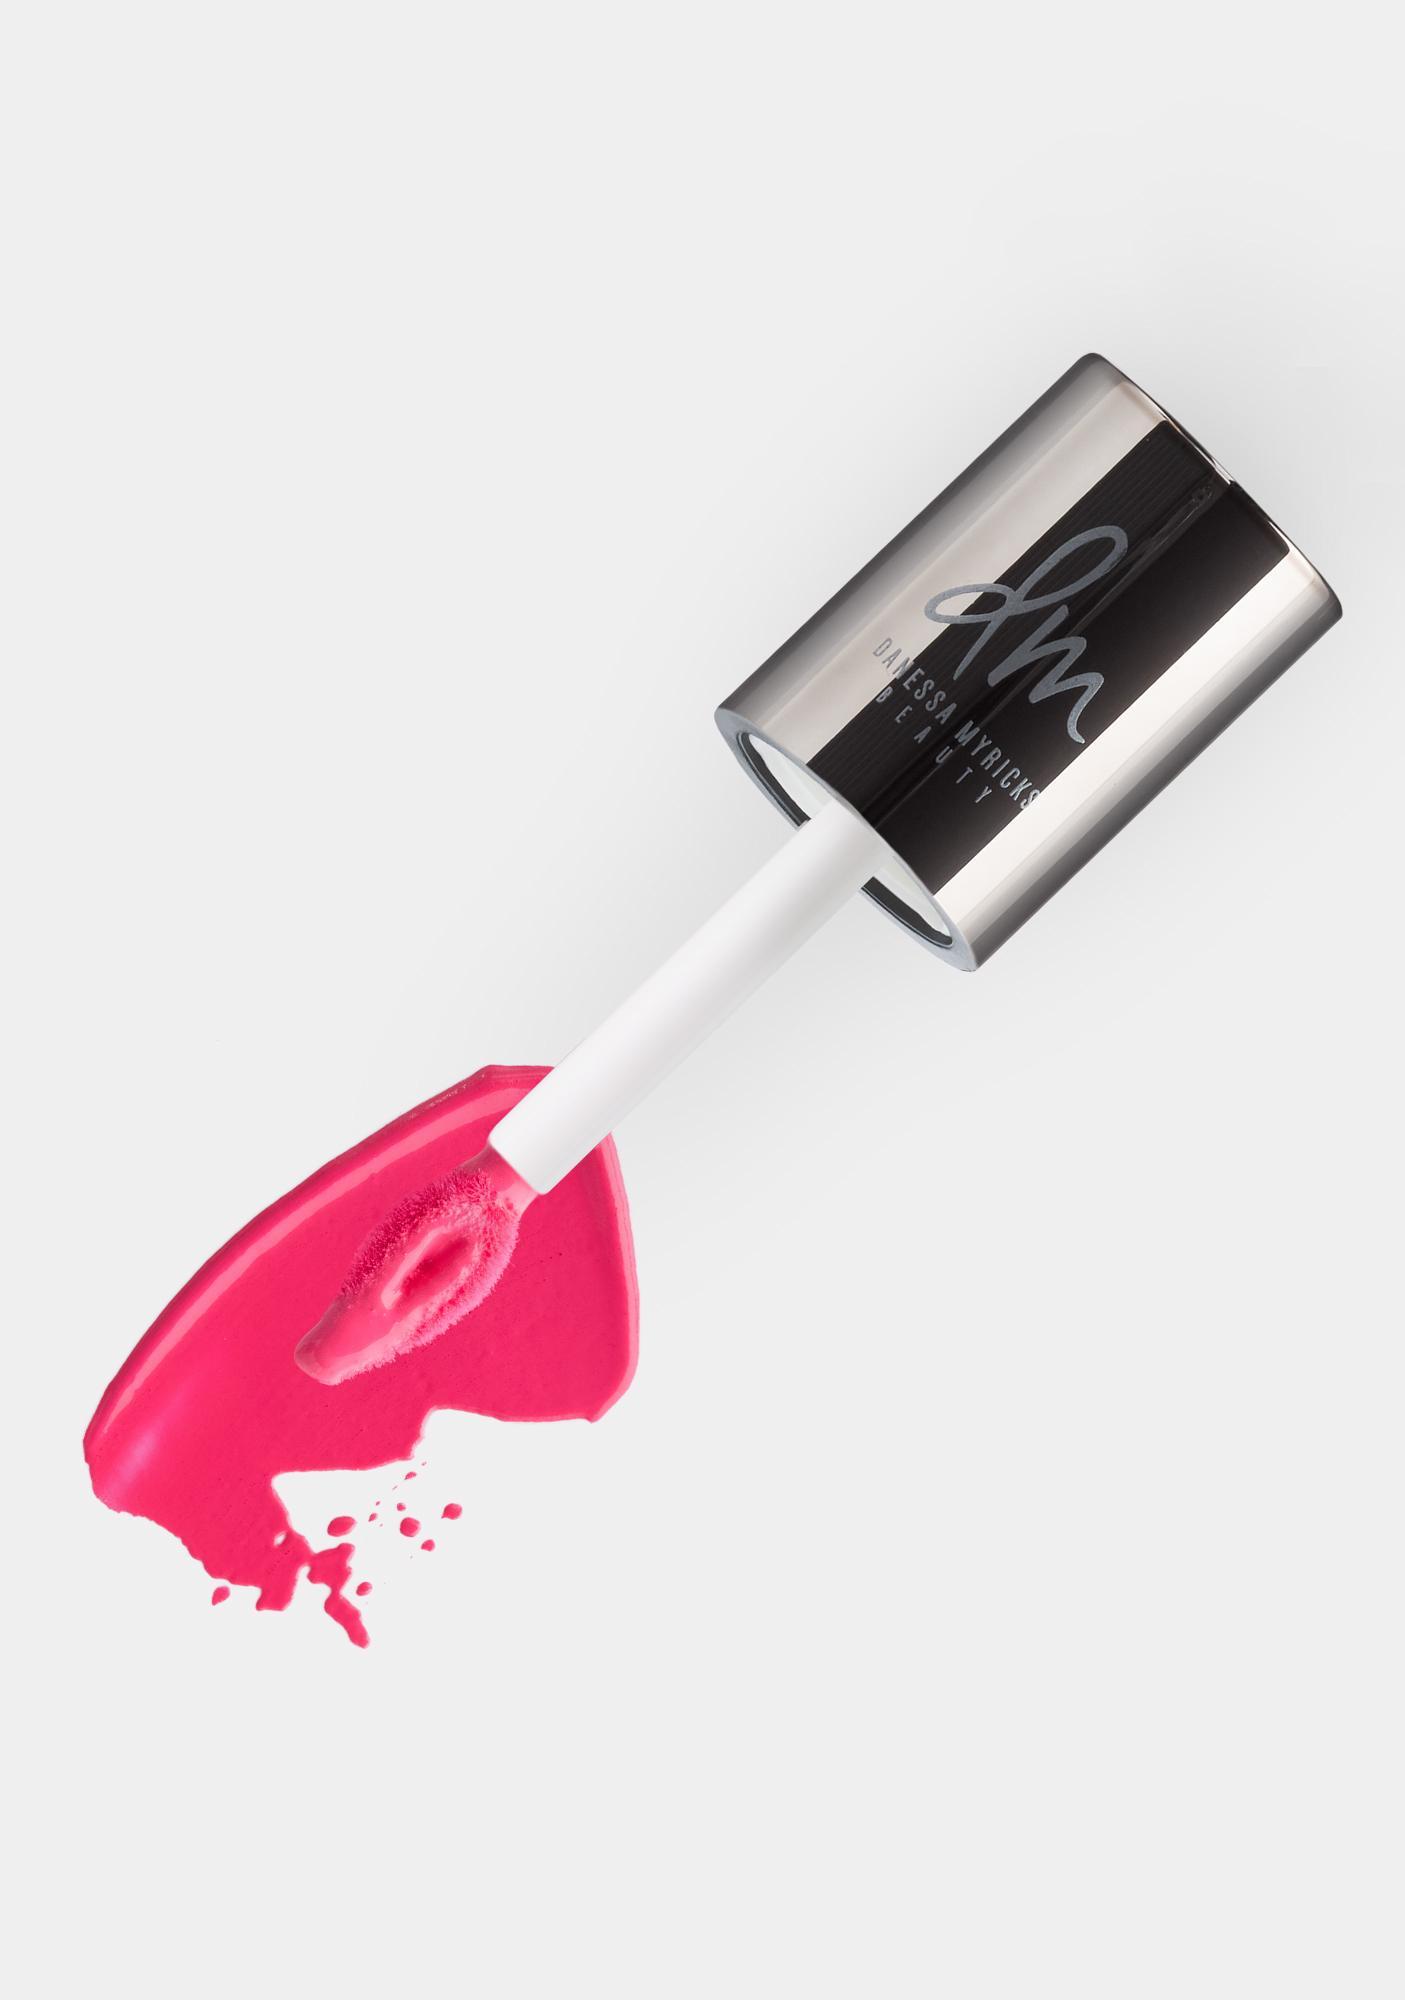 Danessa Myricks Beauty Tutu Vision Flush Lip And Cheek Stain